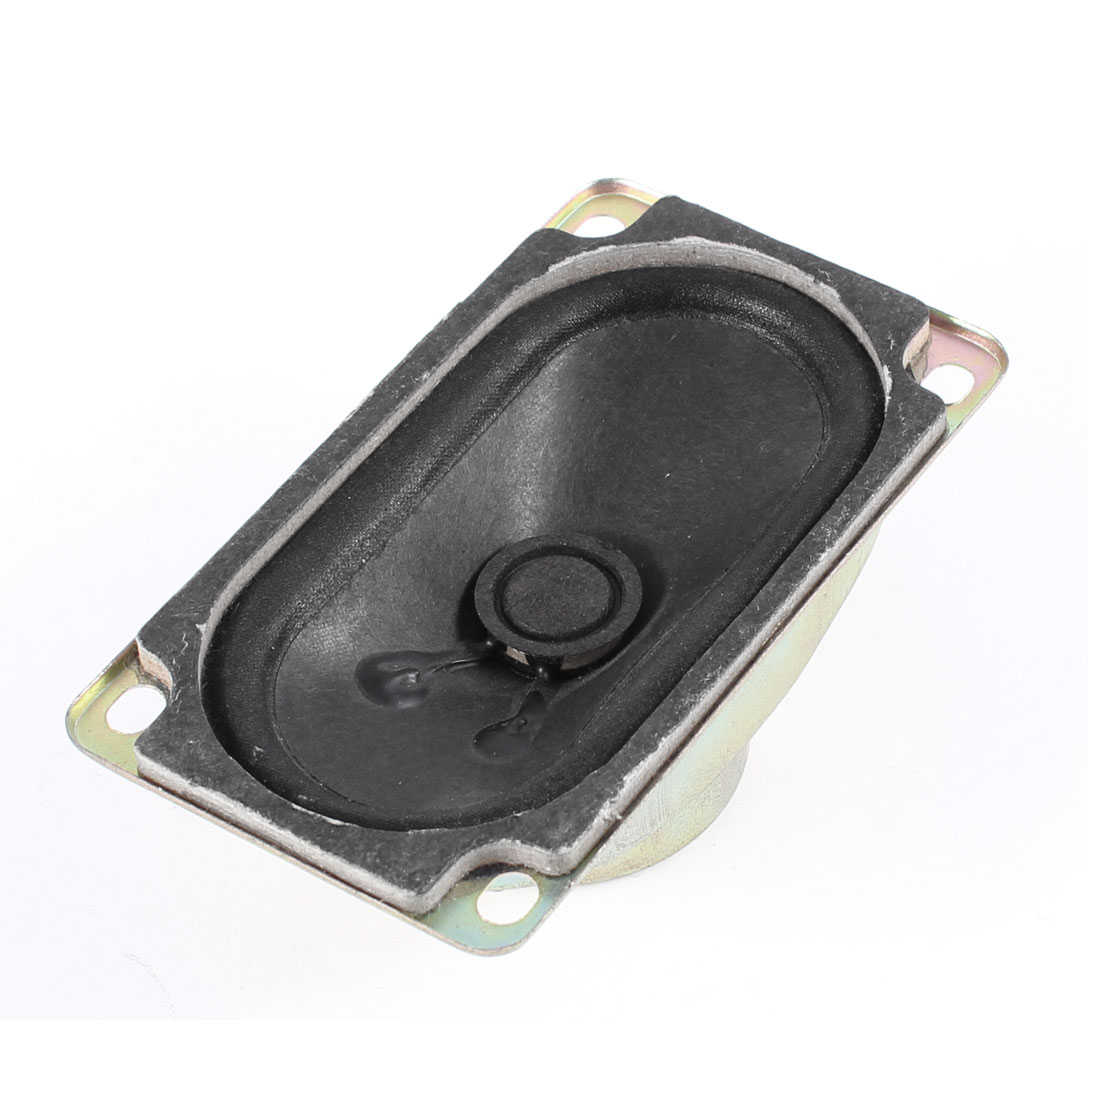 Rectangle Internal Magnet Toys Multimedia Speaker Tweeter Horn 4 Ohm 3W